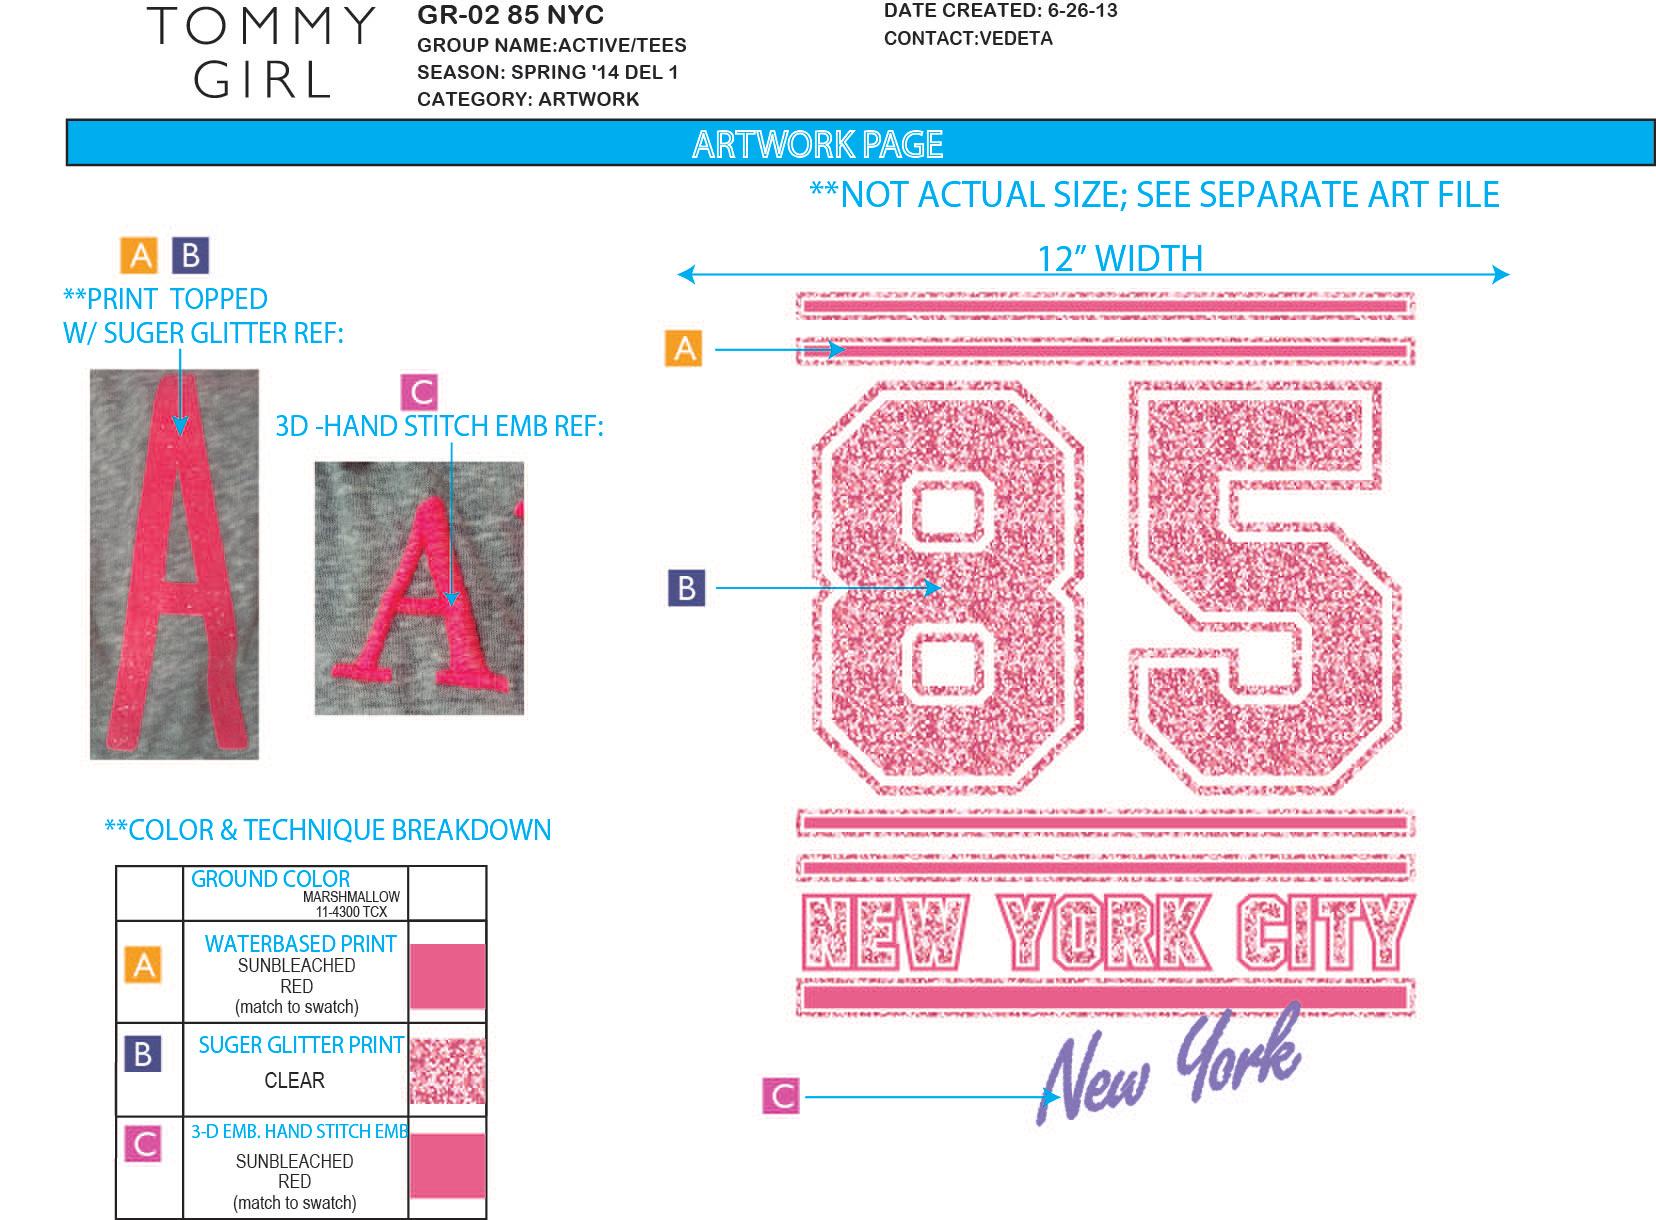 GR-02 85 NYC (1).jpg